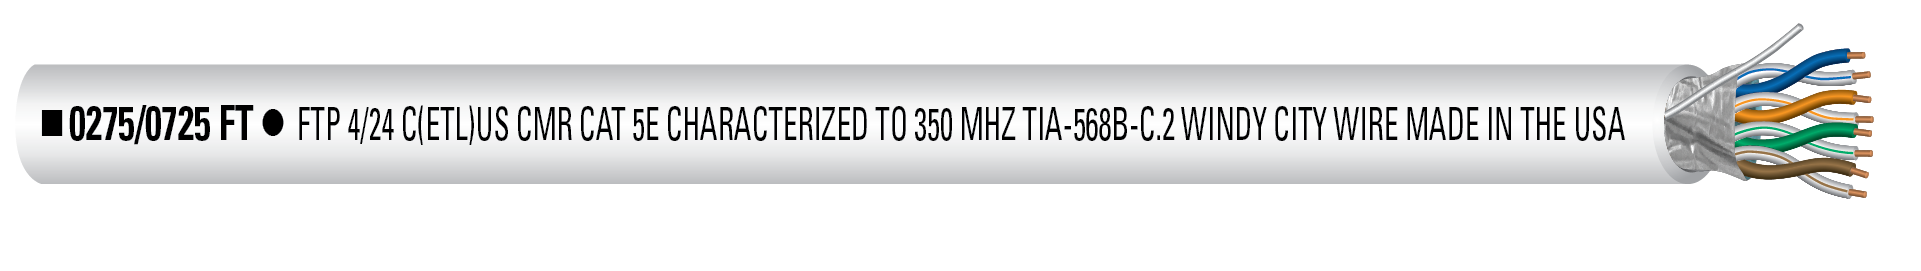 86656210